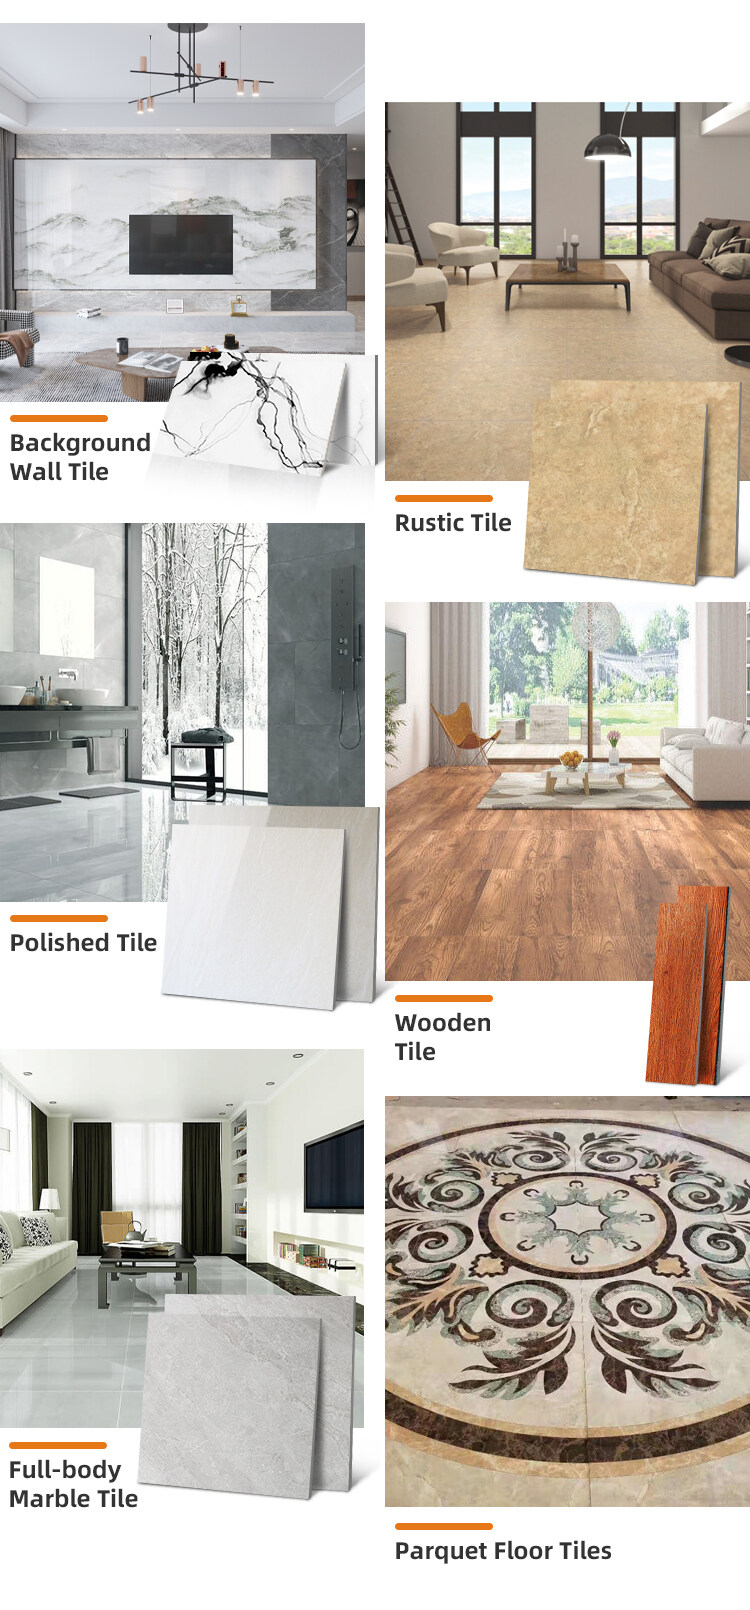 custom drawing room porcelain size marble tiles indoor glossy parquet floor tiles